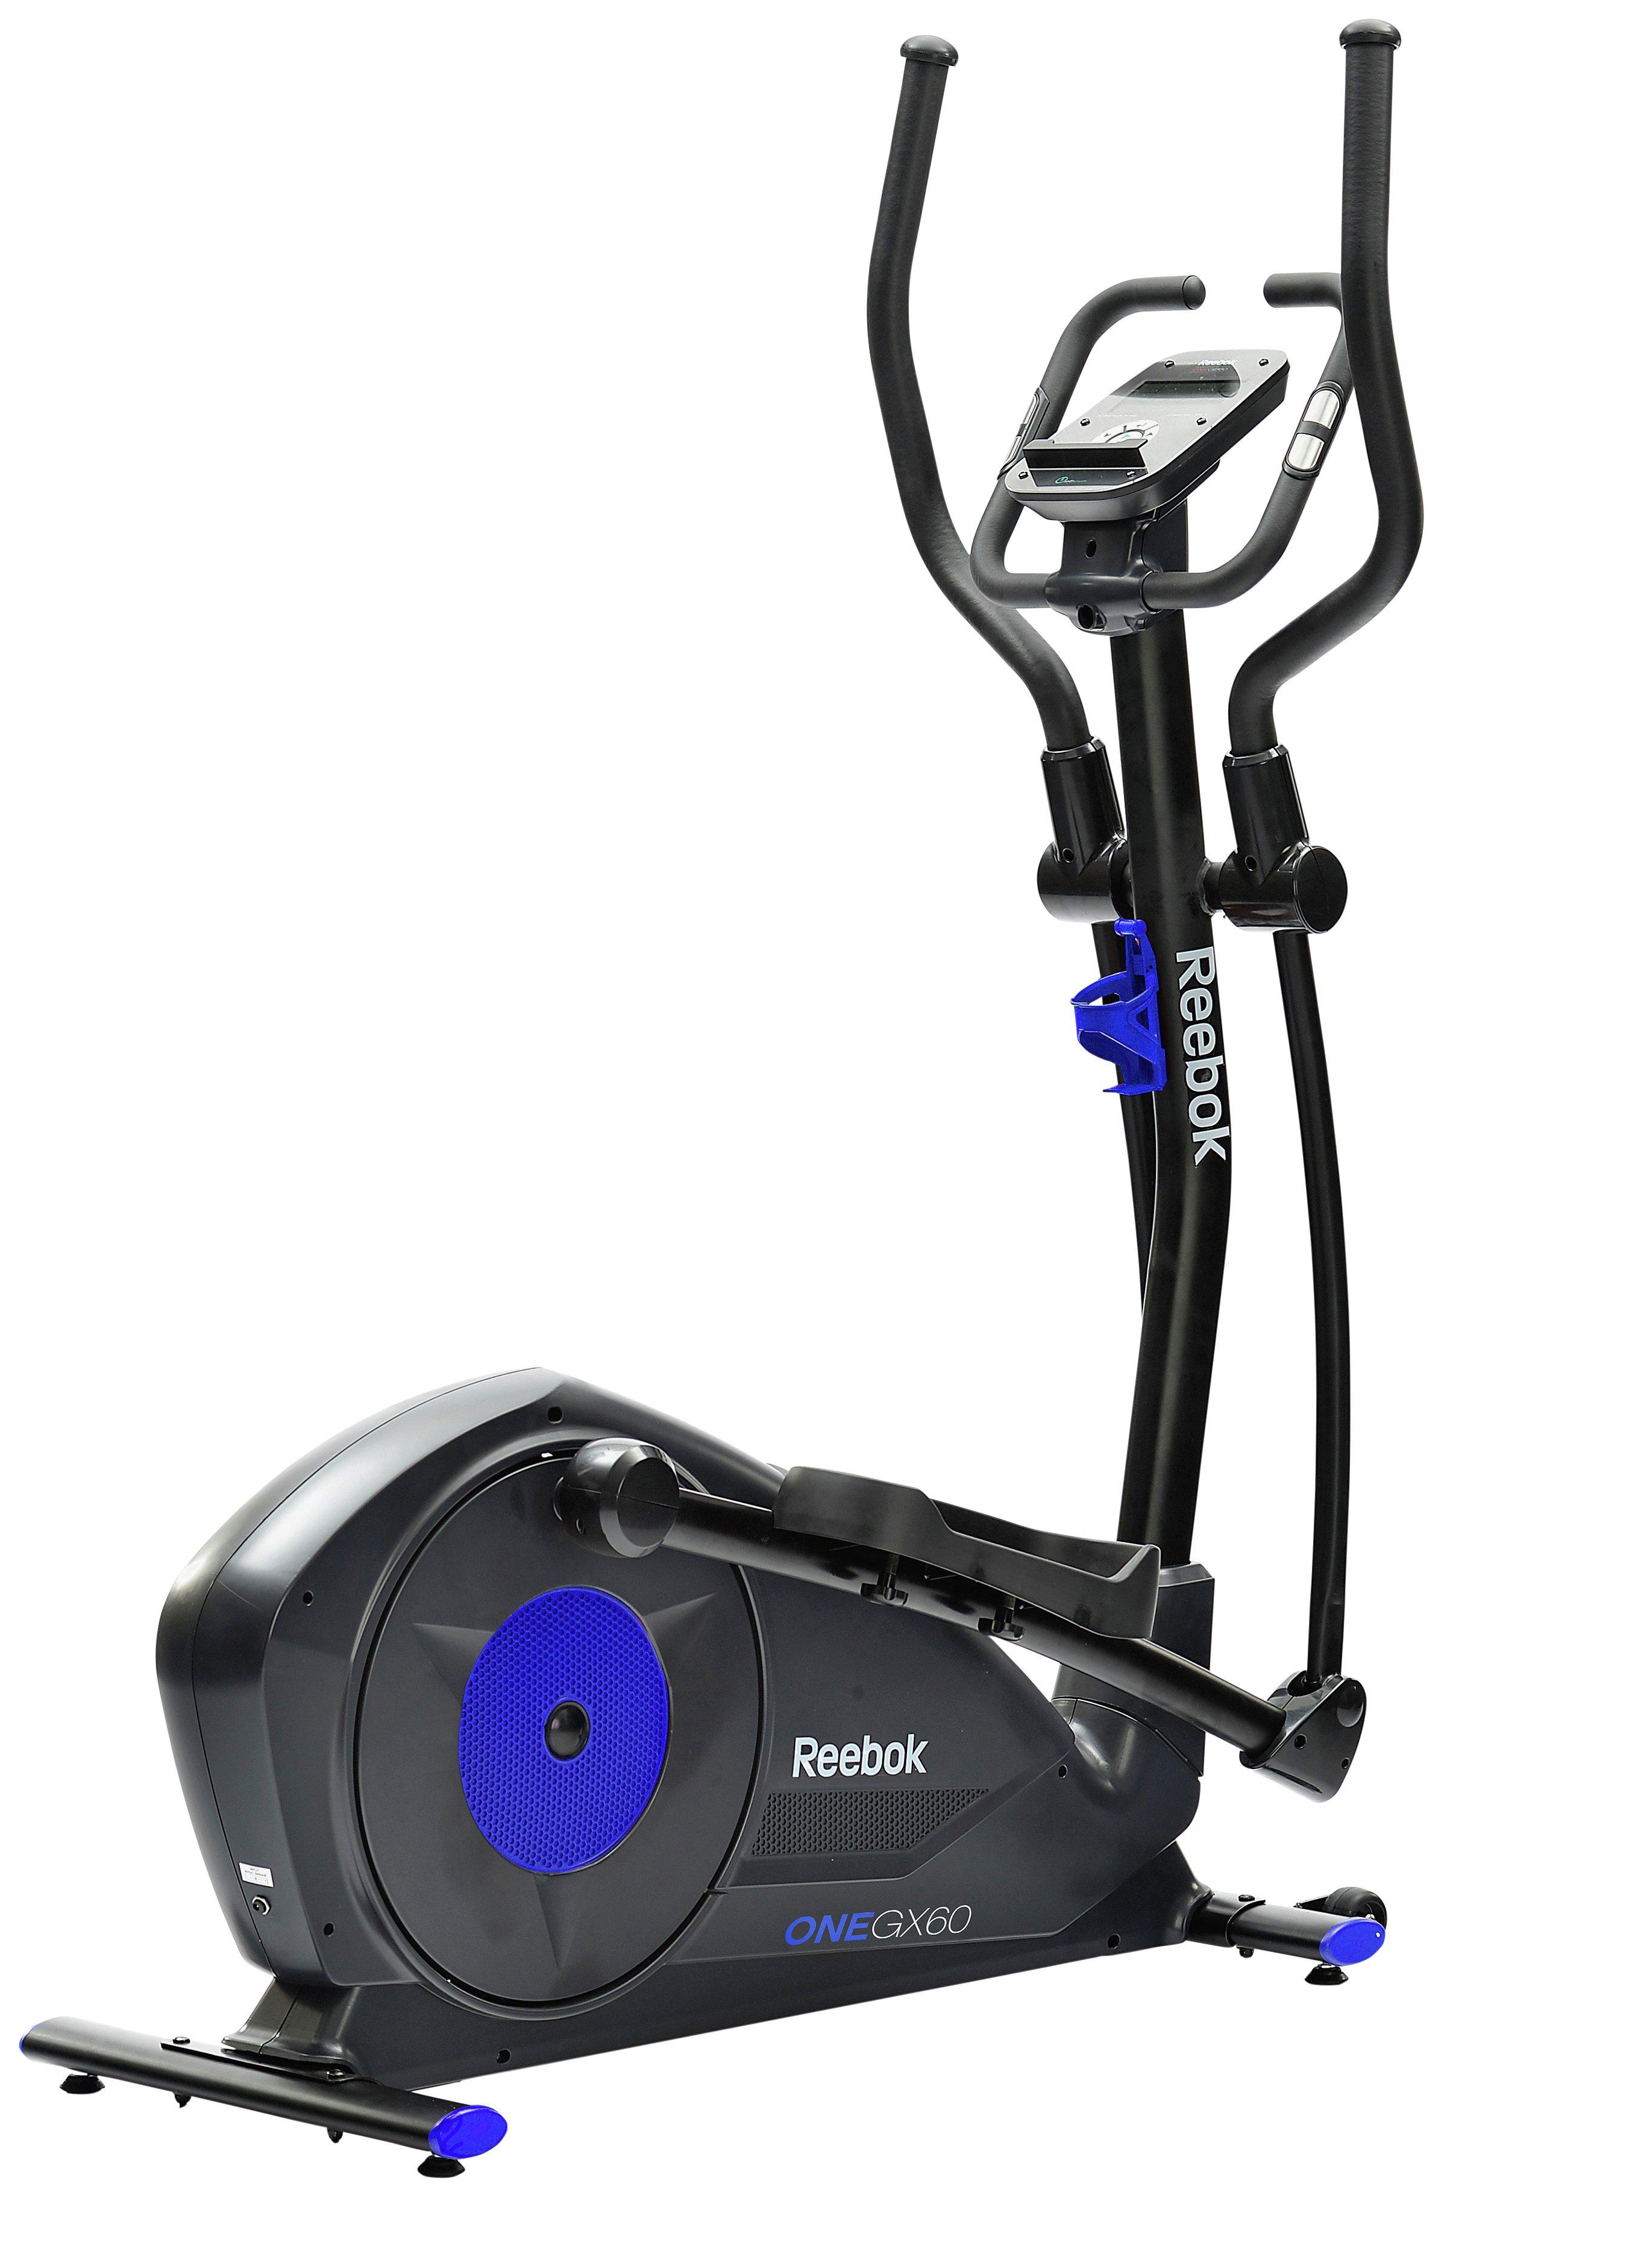 Reebok - One Series GX60 Cross Trainer